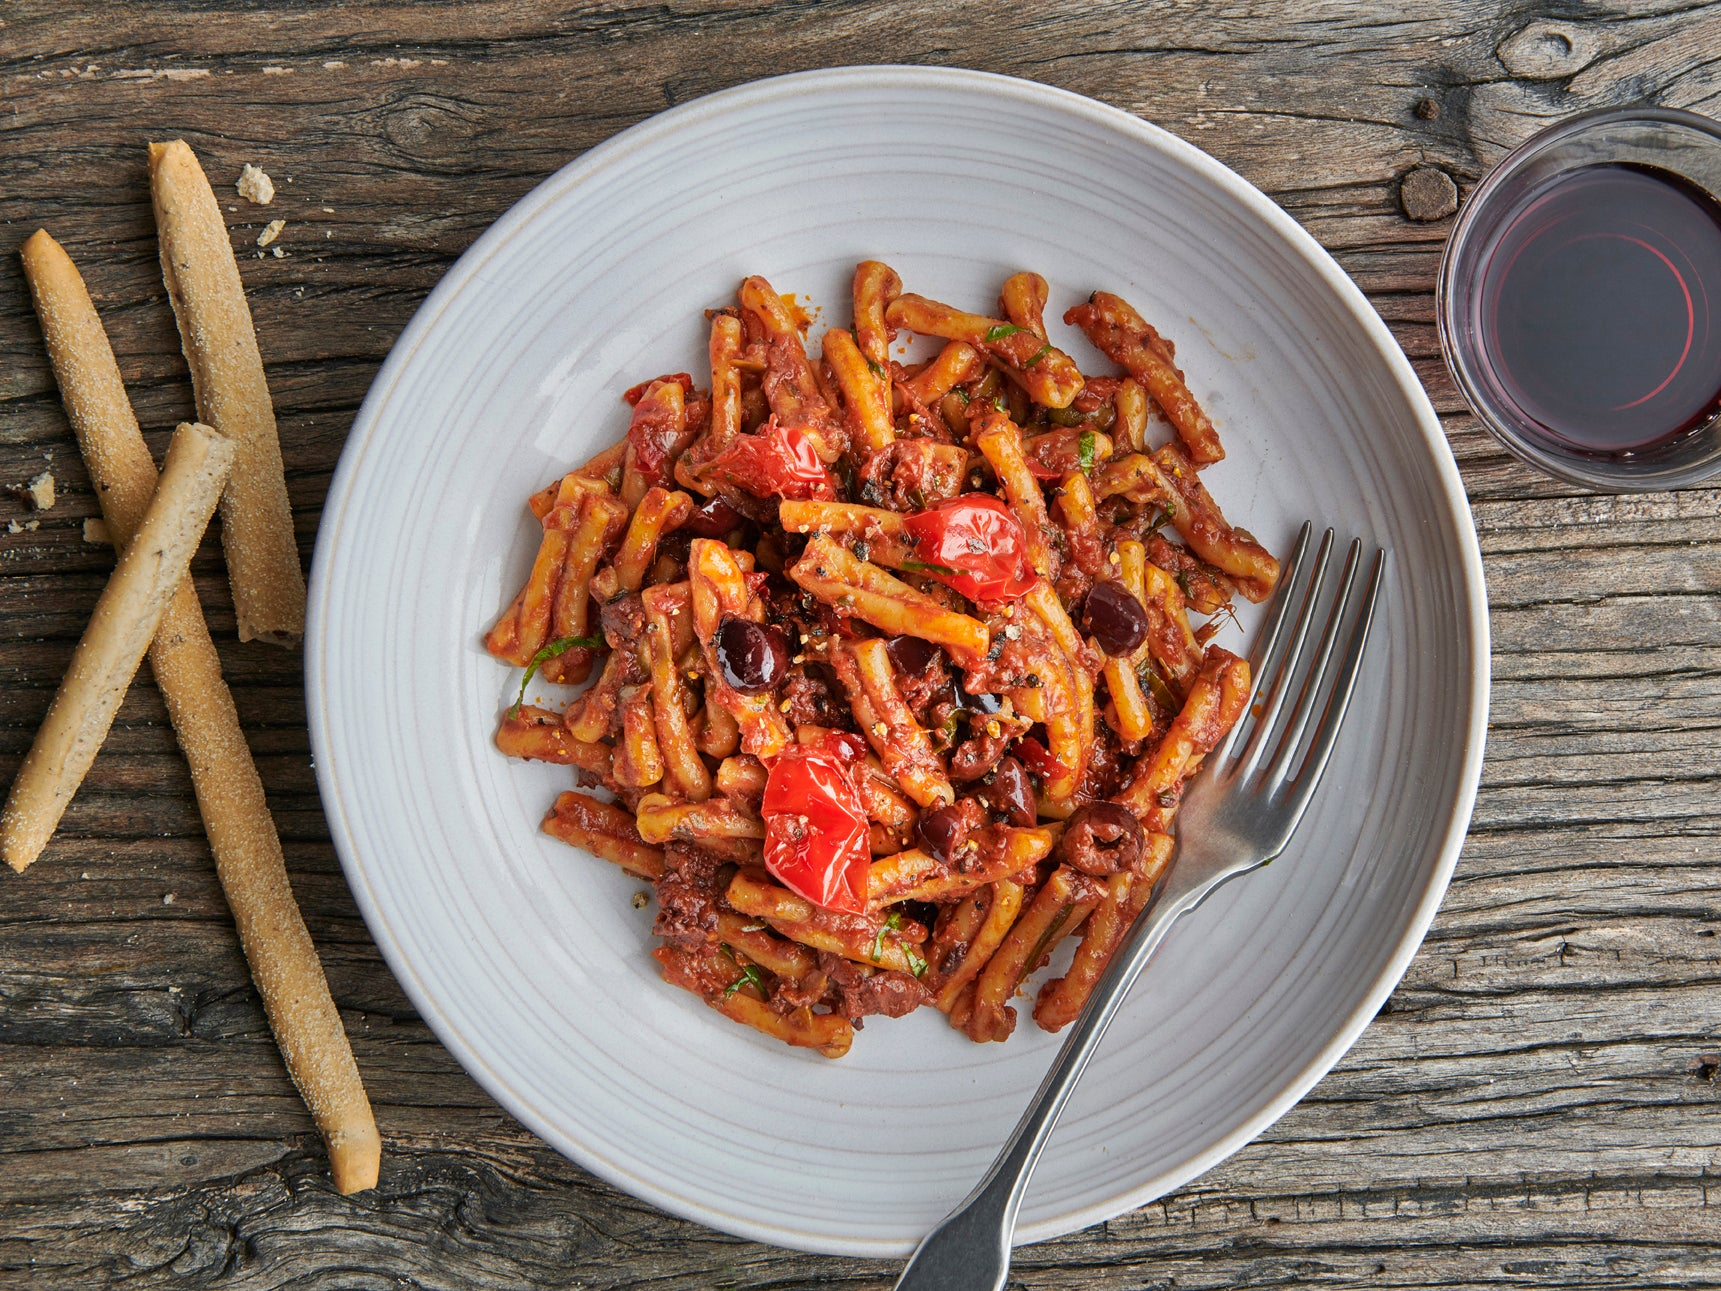 10 Best Gluten Free Pastas The Independent